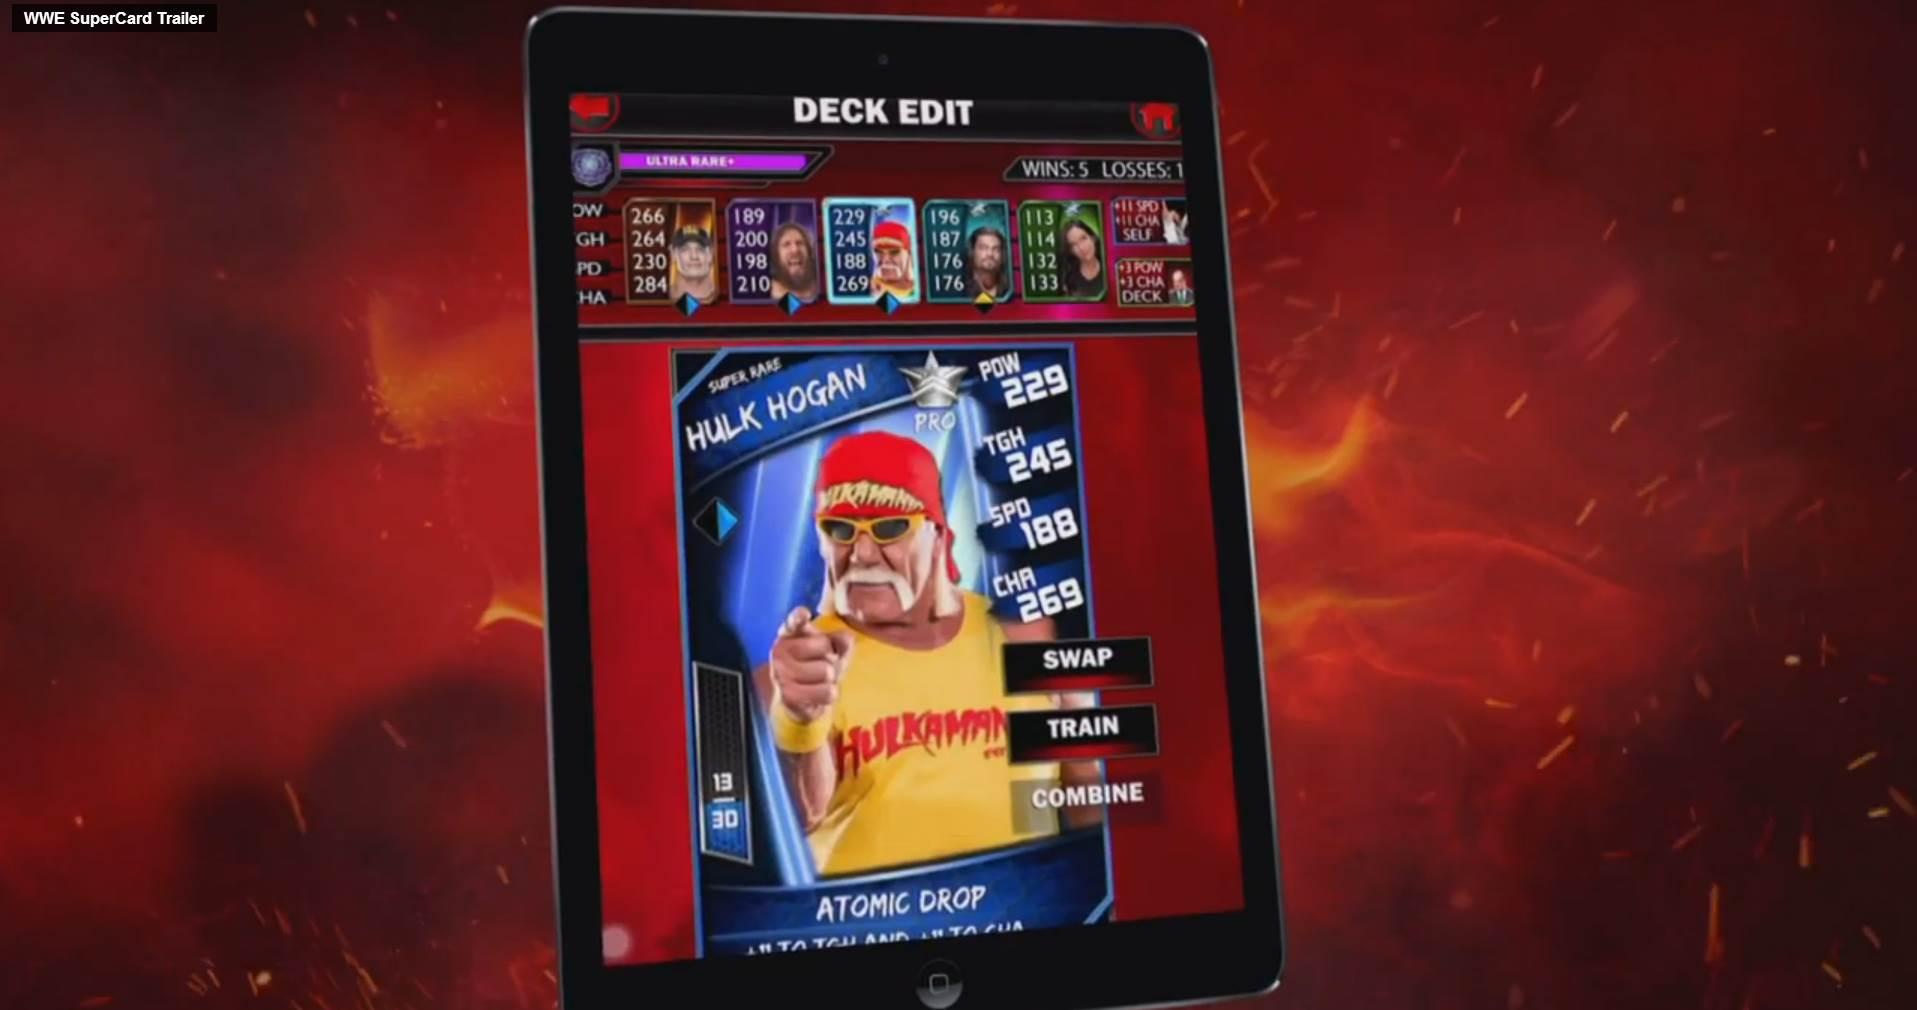 WWE Supercard: Wrestling springt auf Hearthstone-Zug